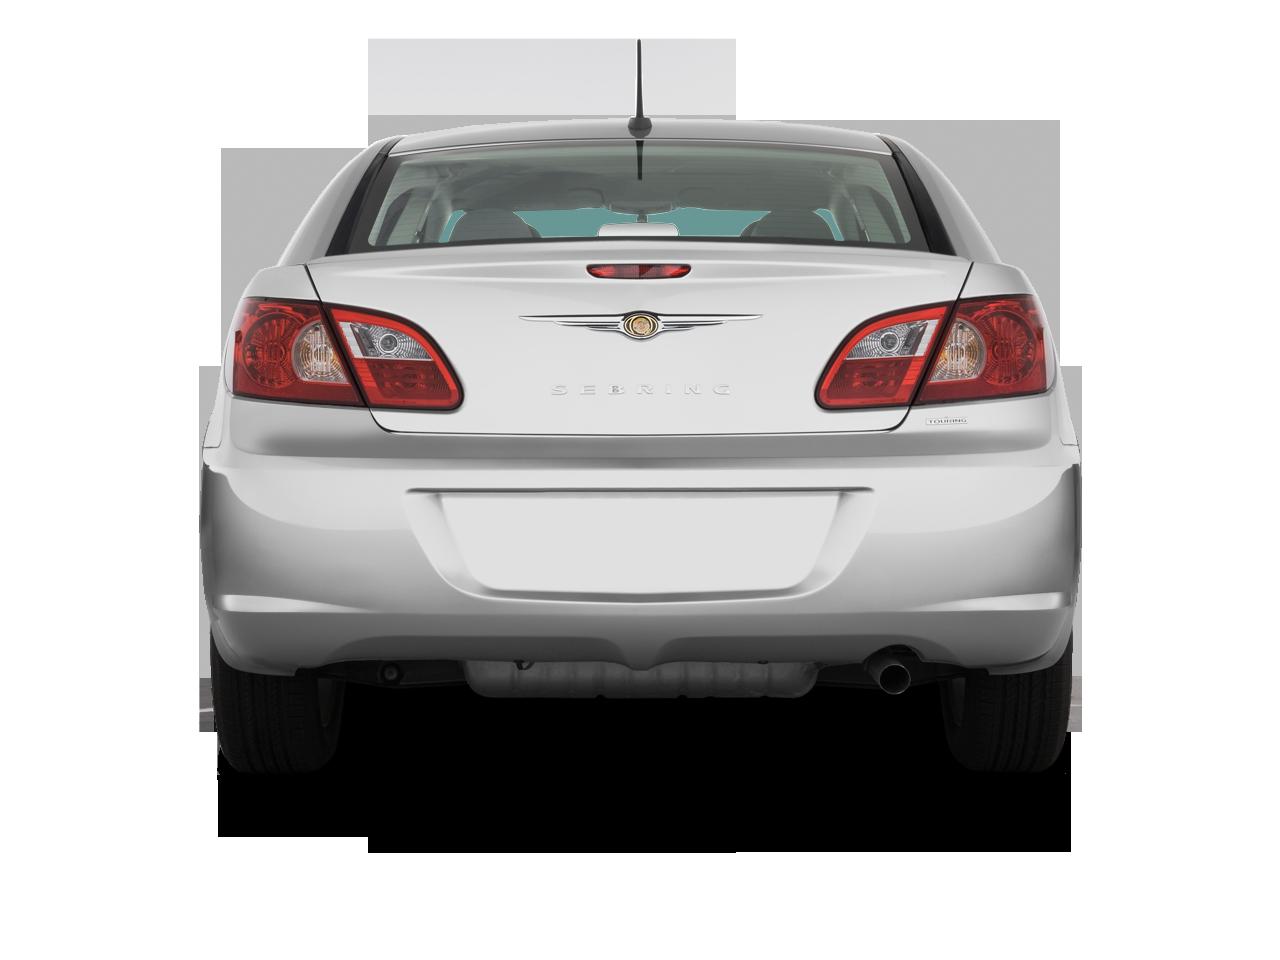 2008 Chrysler Sebring Convertible Latest News Auto Show